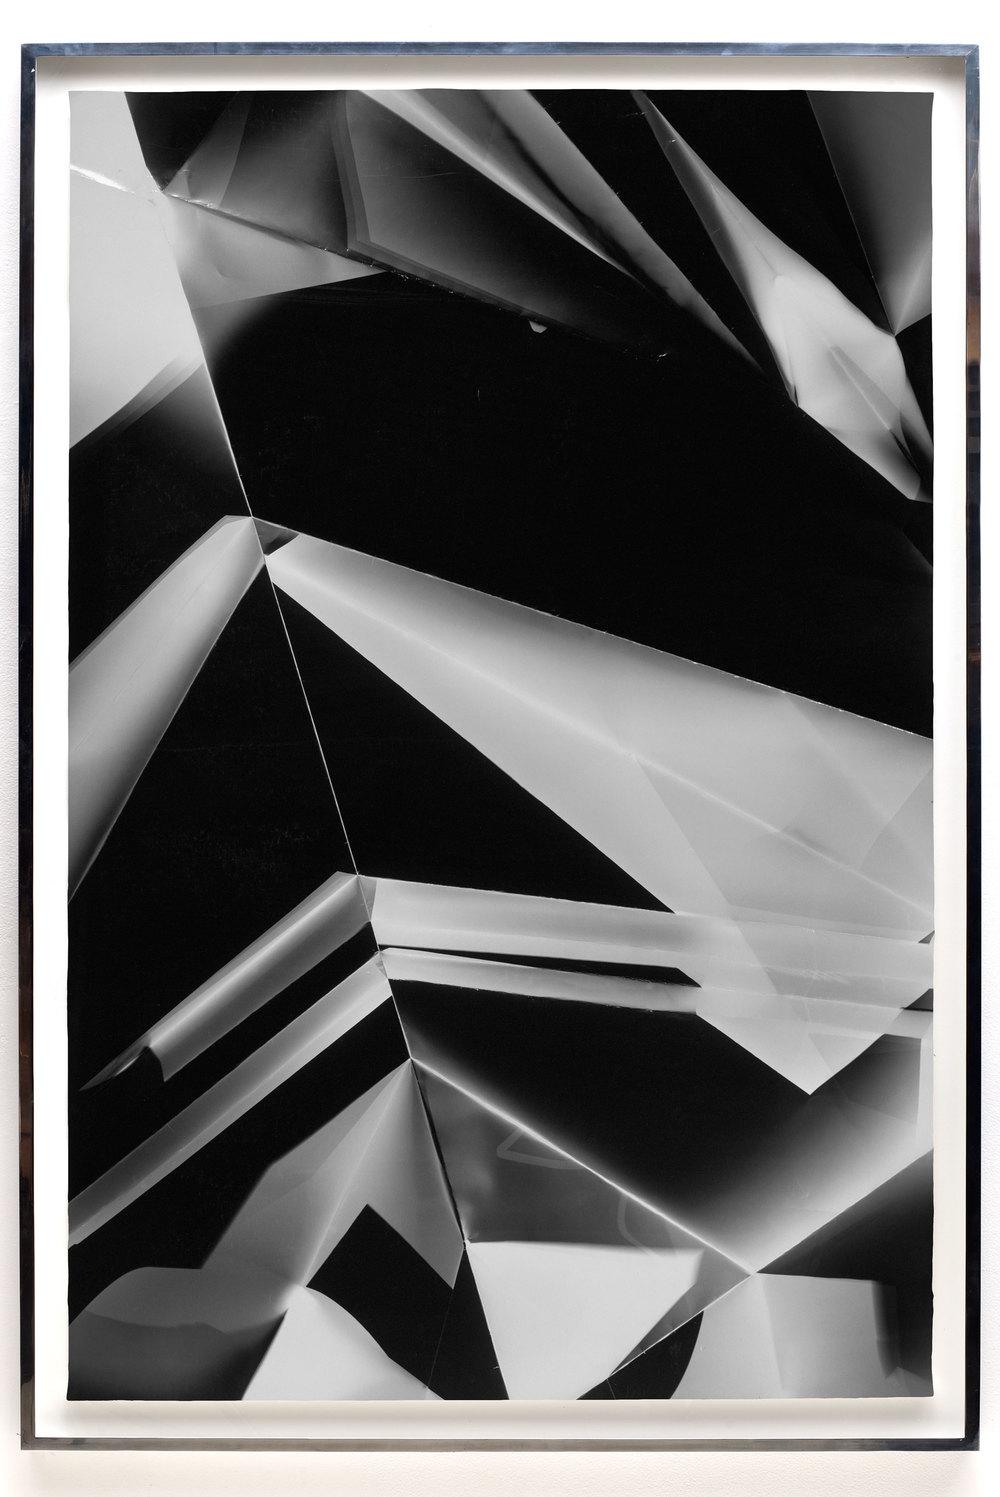 Fold (45º/135º/225º/315º directional light sources), June 27, 2008, Annandale-On-Hudson, New York, Foma Multigrade Fiber    2009   Black and white fiber based photographic paper  67 1/2 x 46 3/4 inches   Legibility on Color Backgrounds, 2009